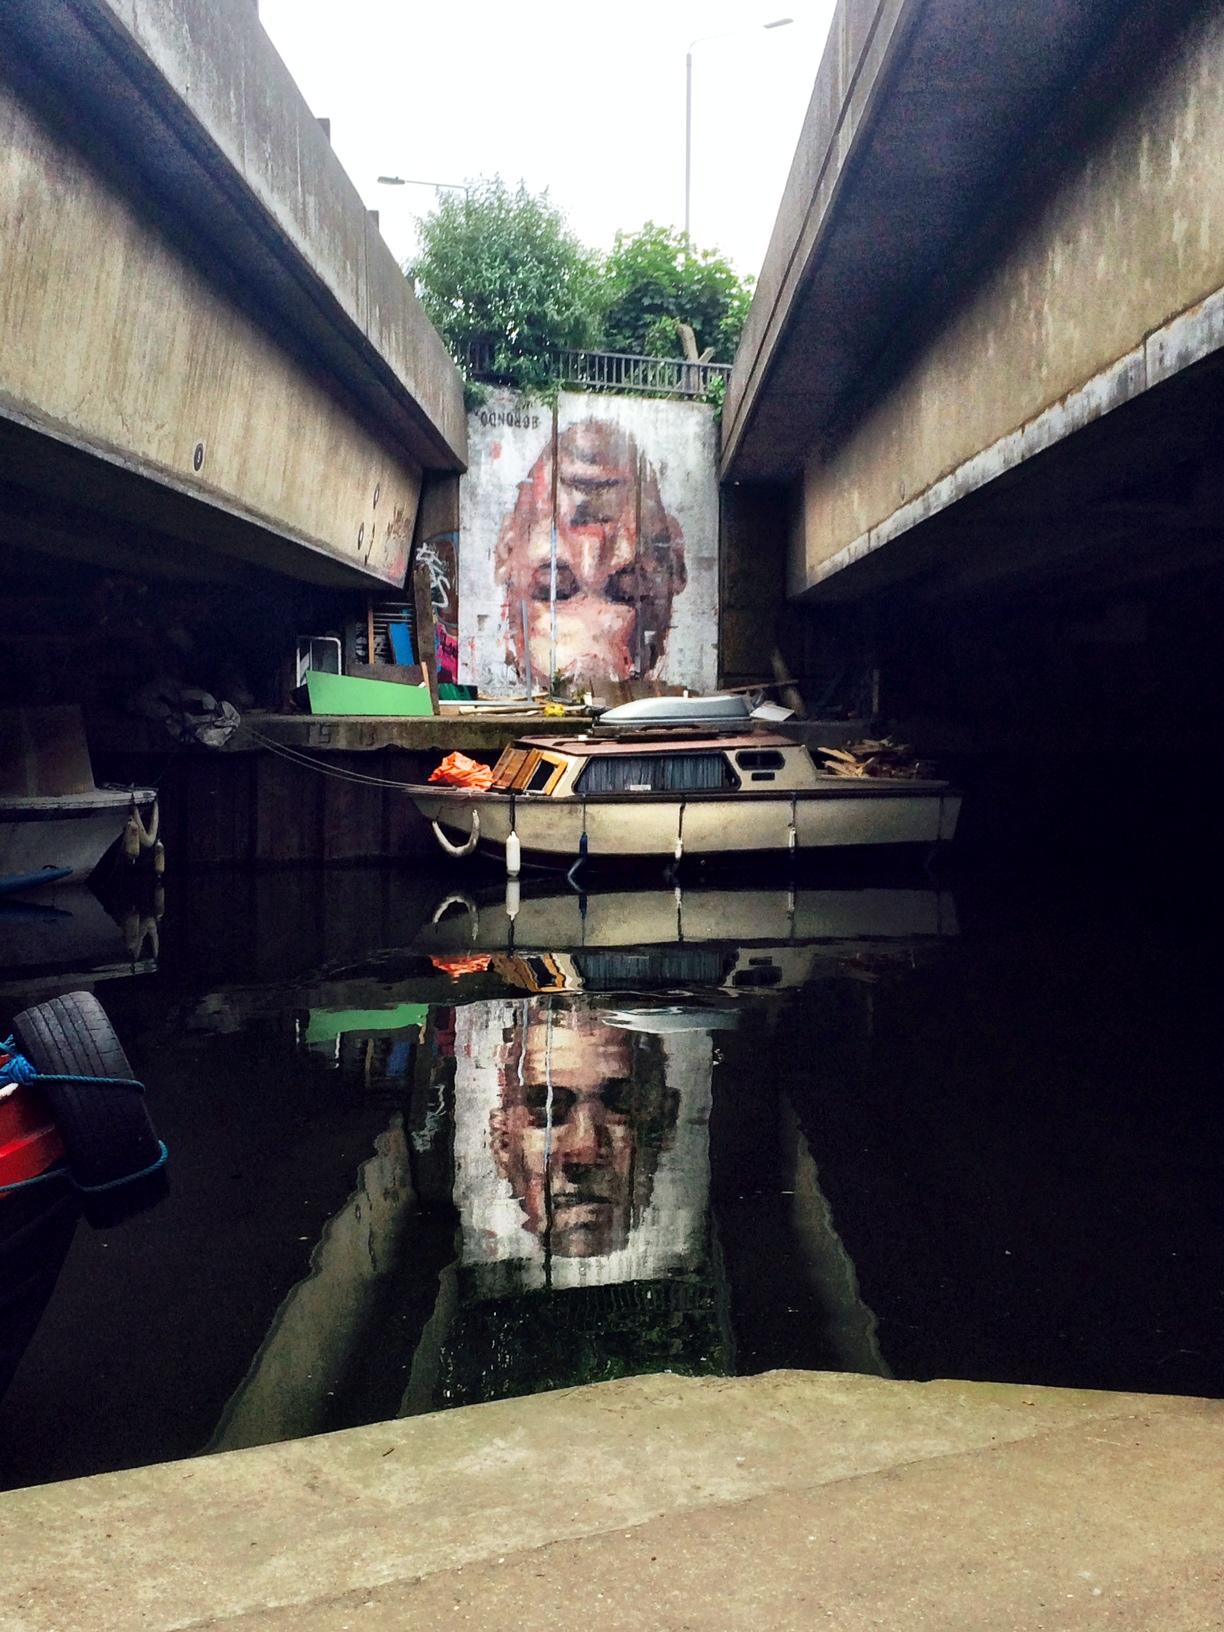 borondo hertford union canal